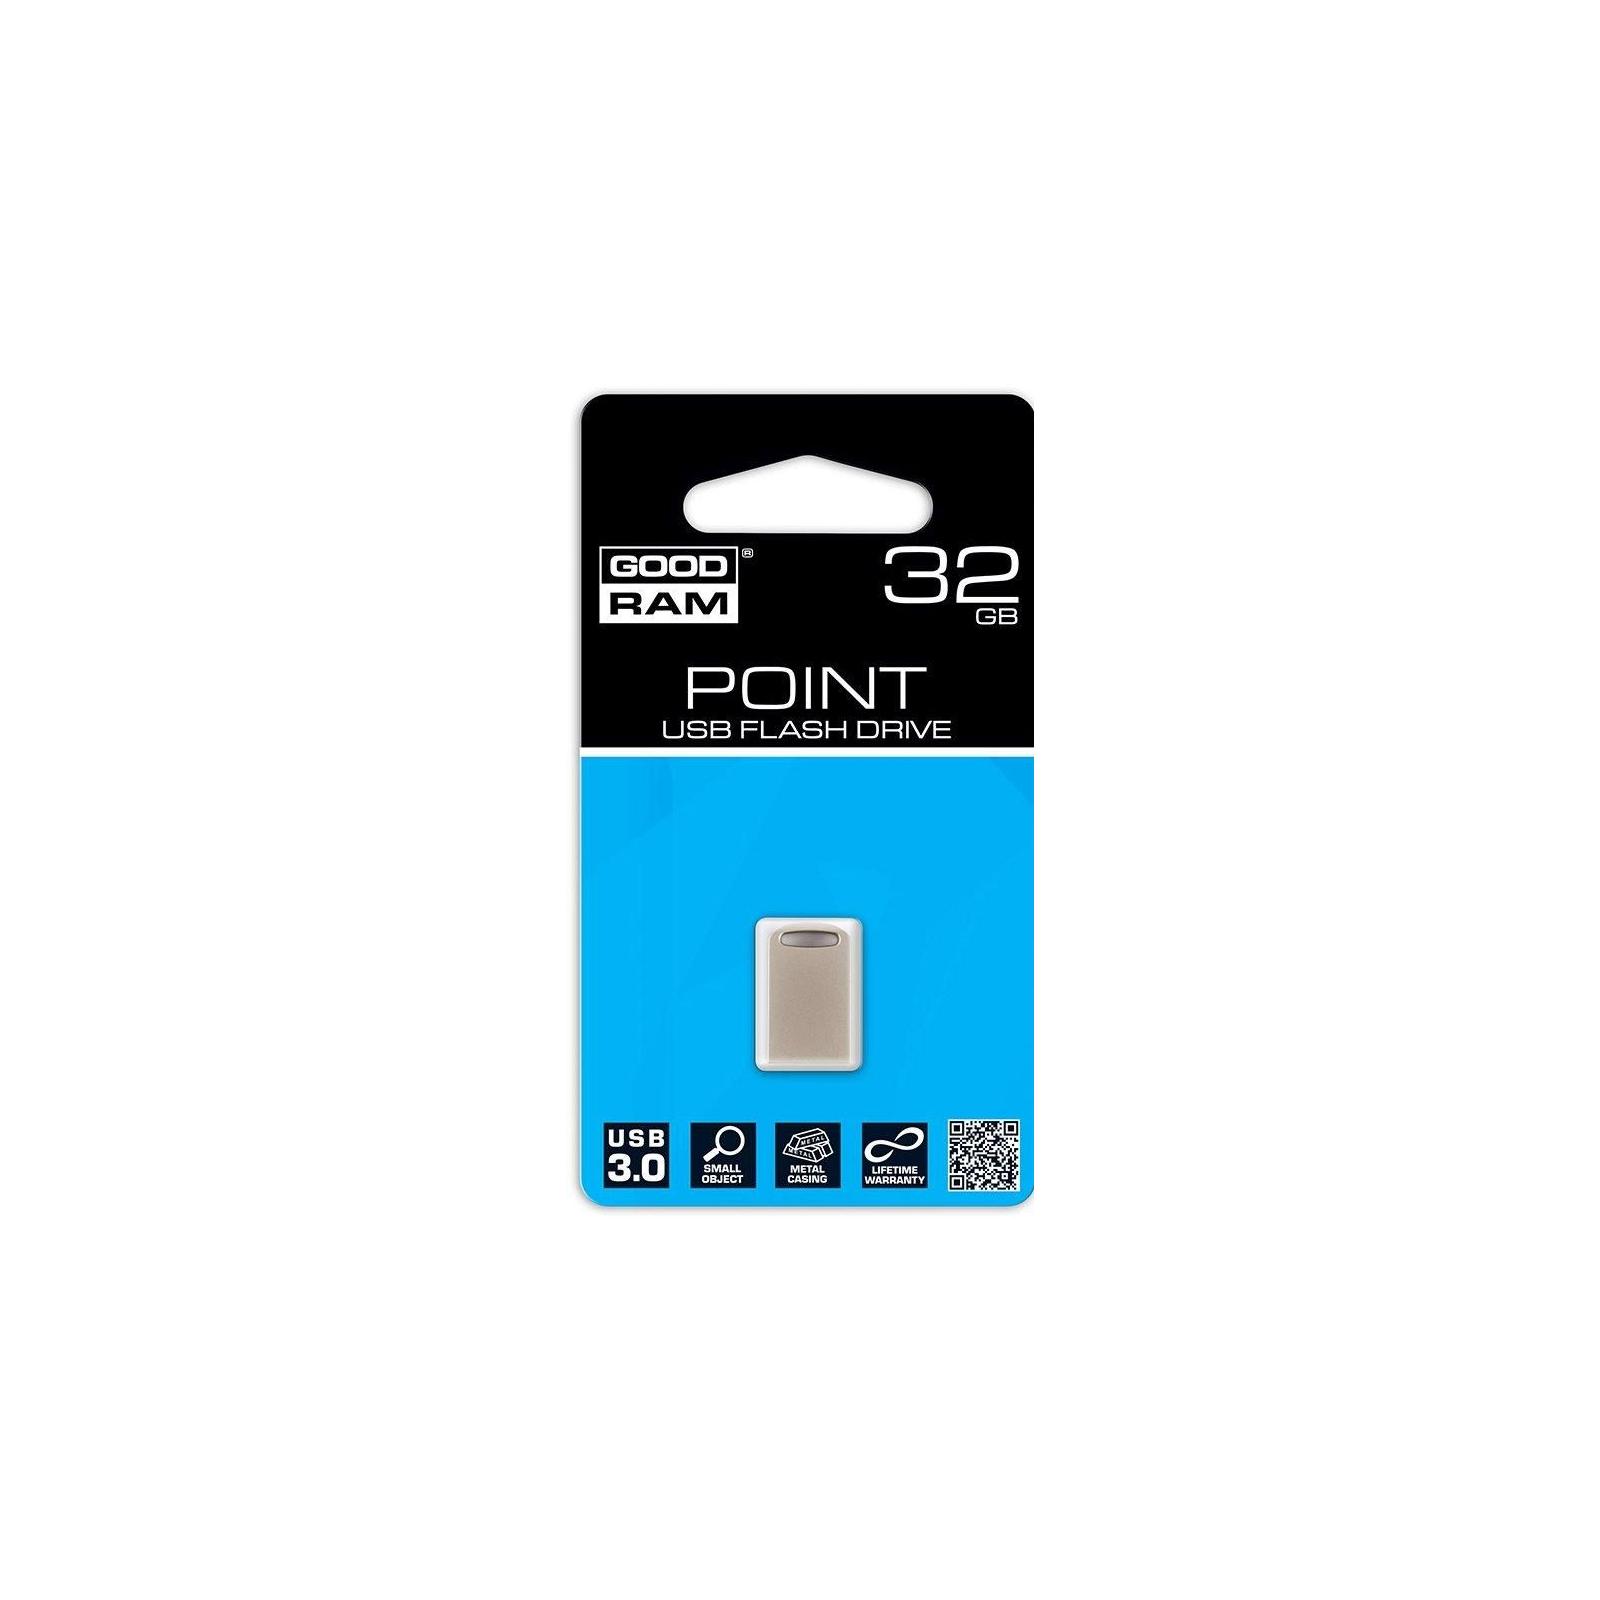 USB флеш накопитель GOODRAM 32GB Point Silver USB 3.0 (UPO3-0320S0R11) изображение 3